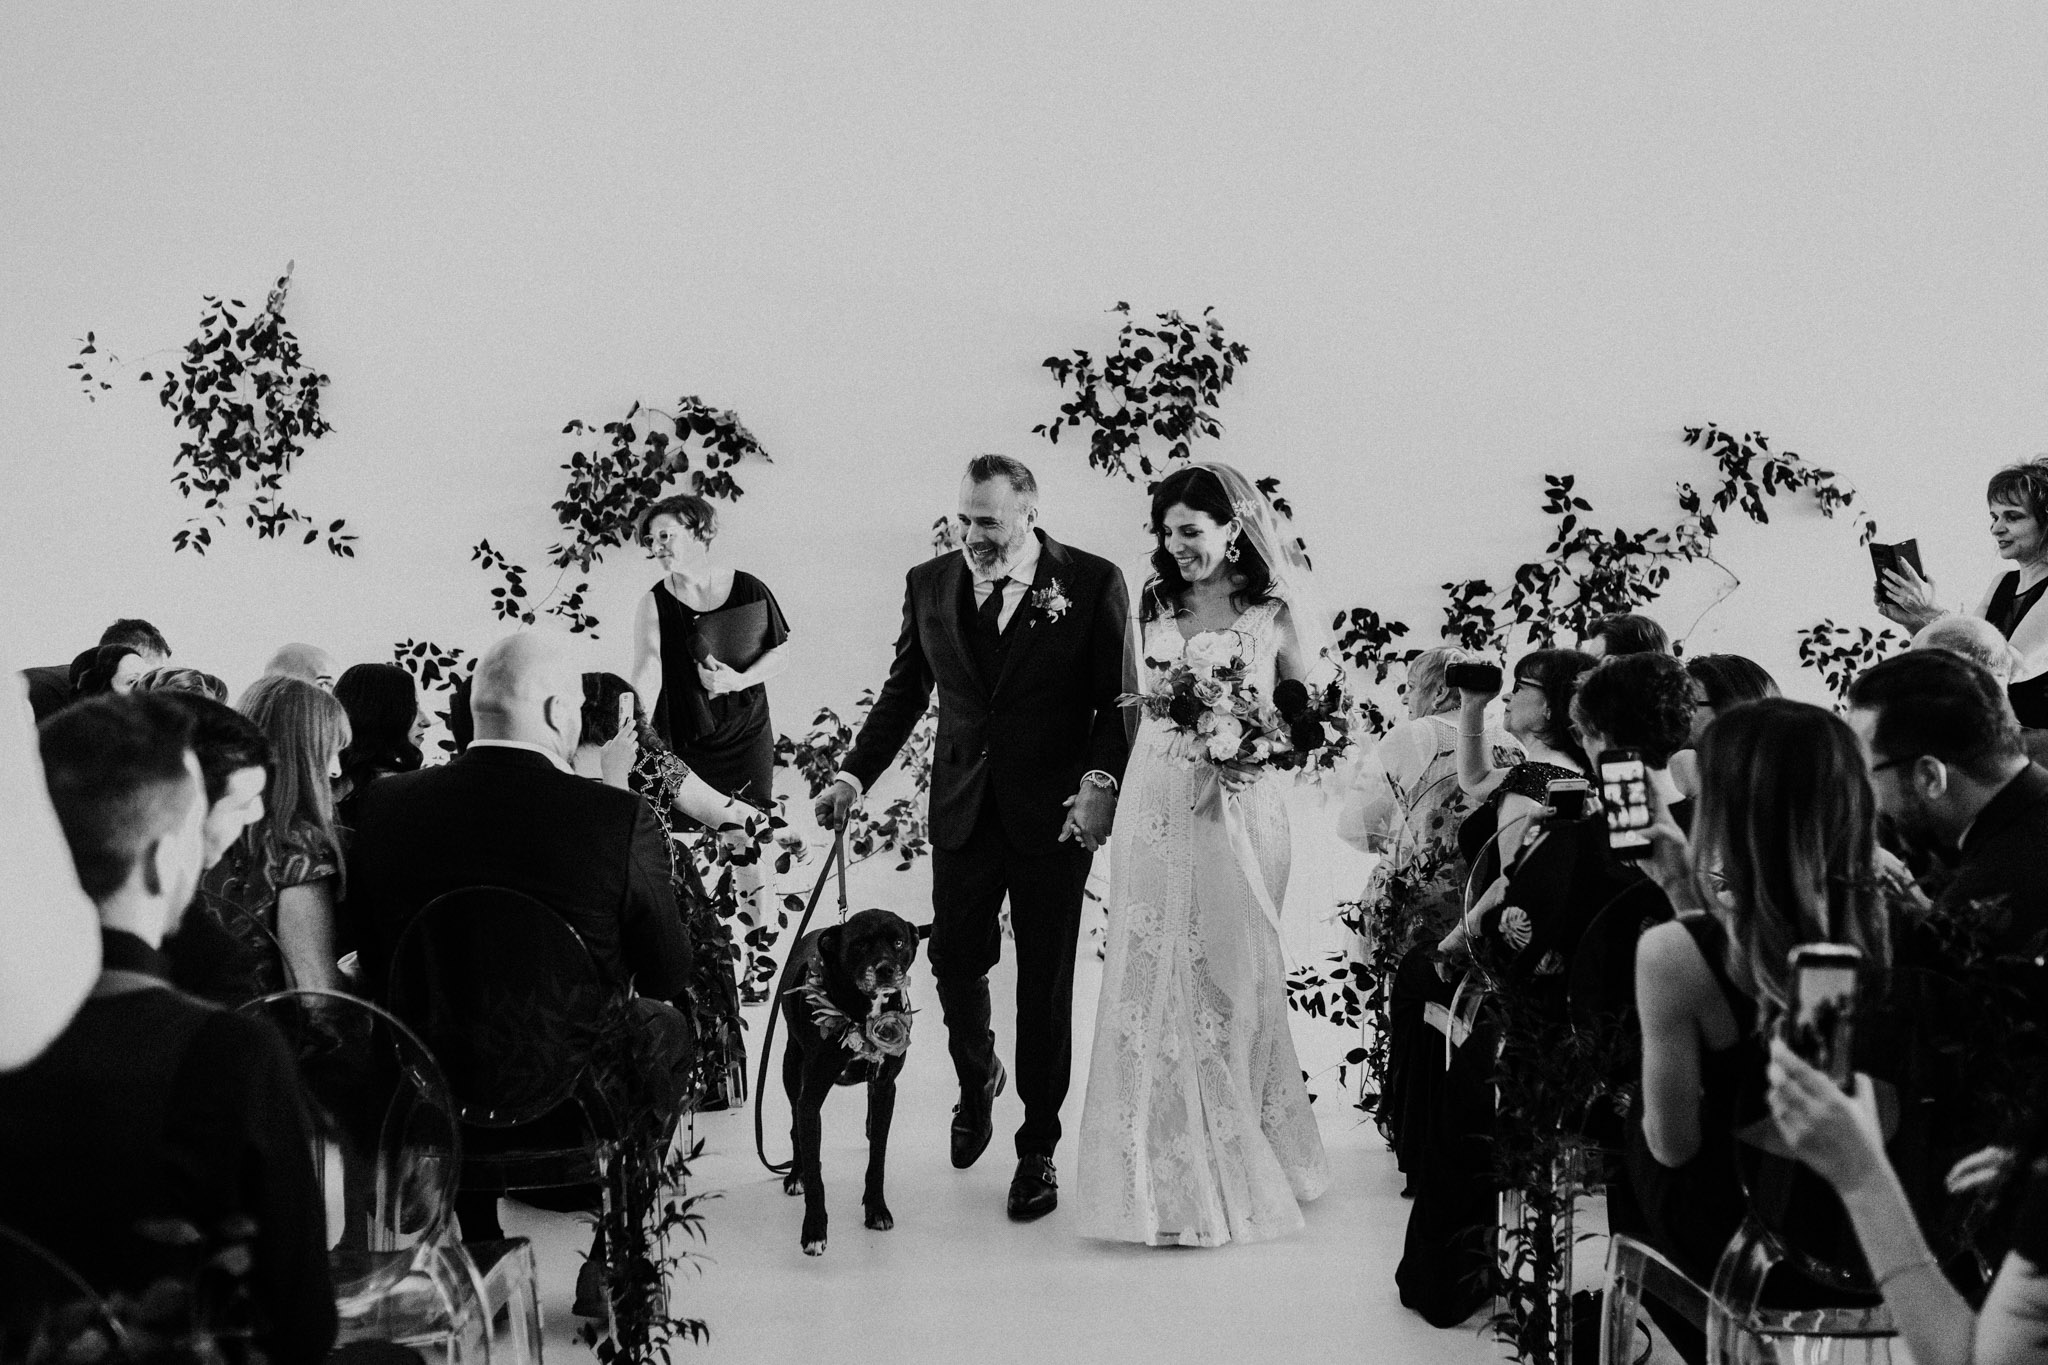 District 28 Wedding Toronto - Bride & groom walk with dog down aisle